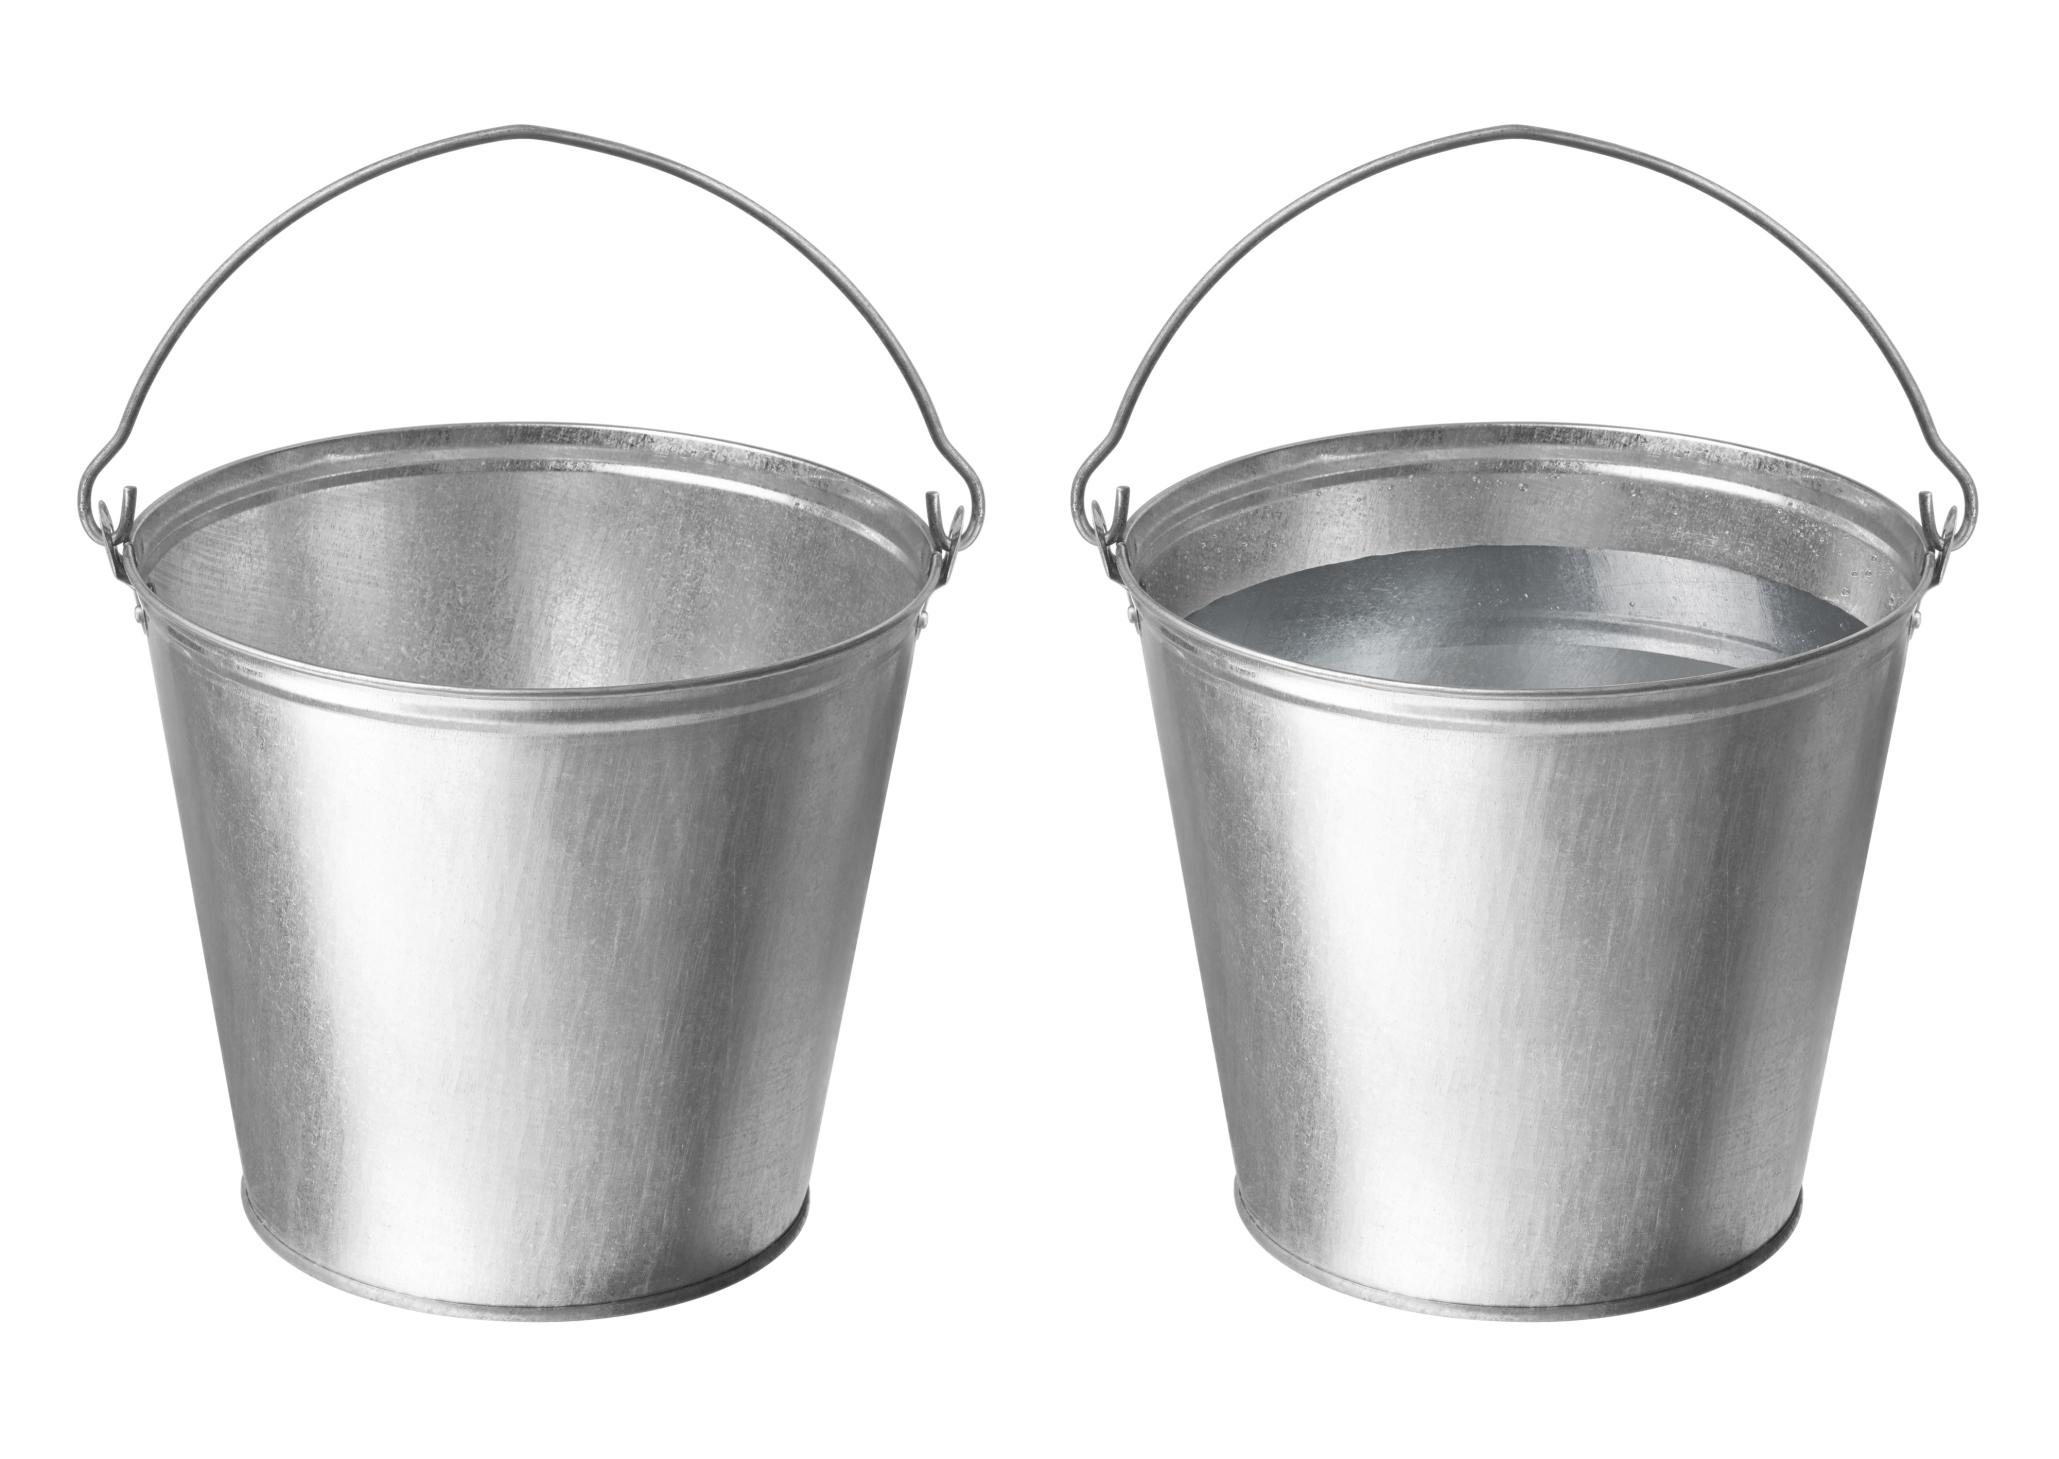 Saturation Vs. Deficiency: Fill your empty buckets